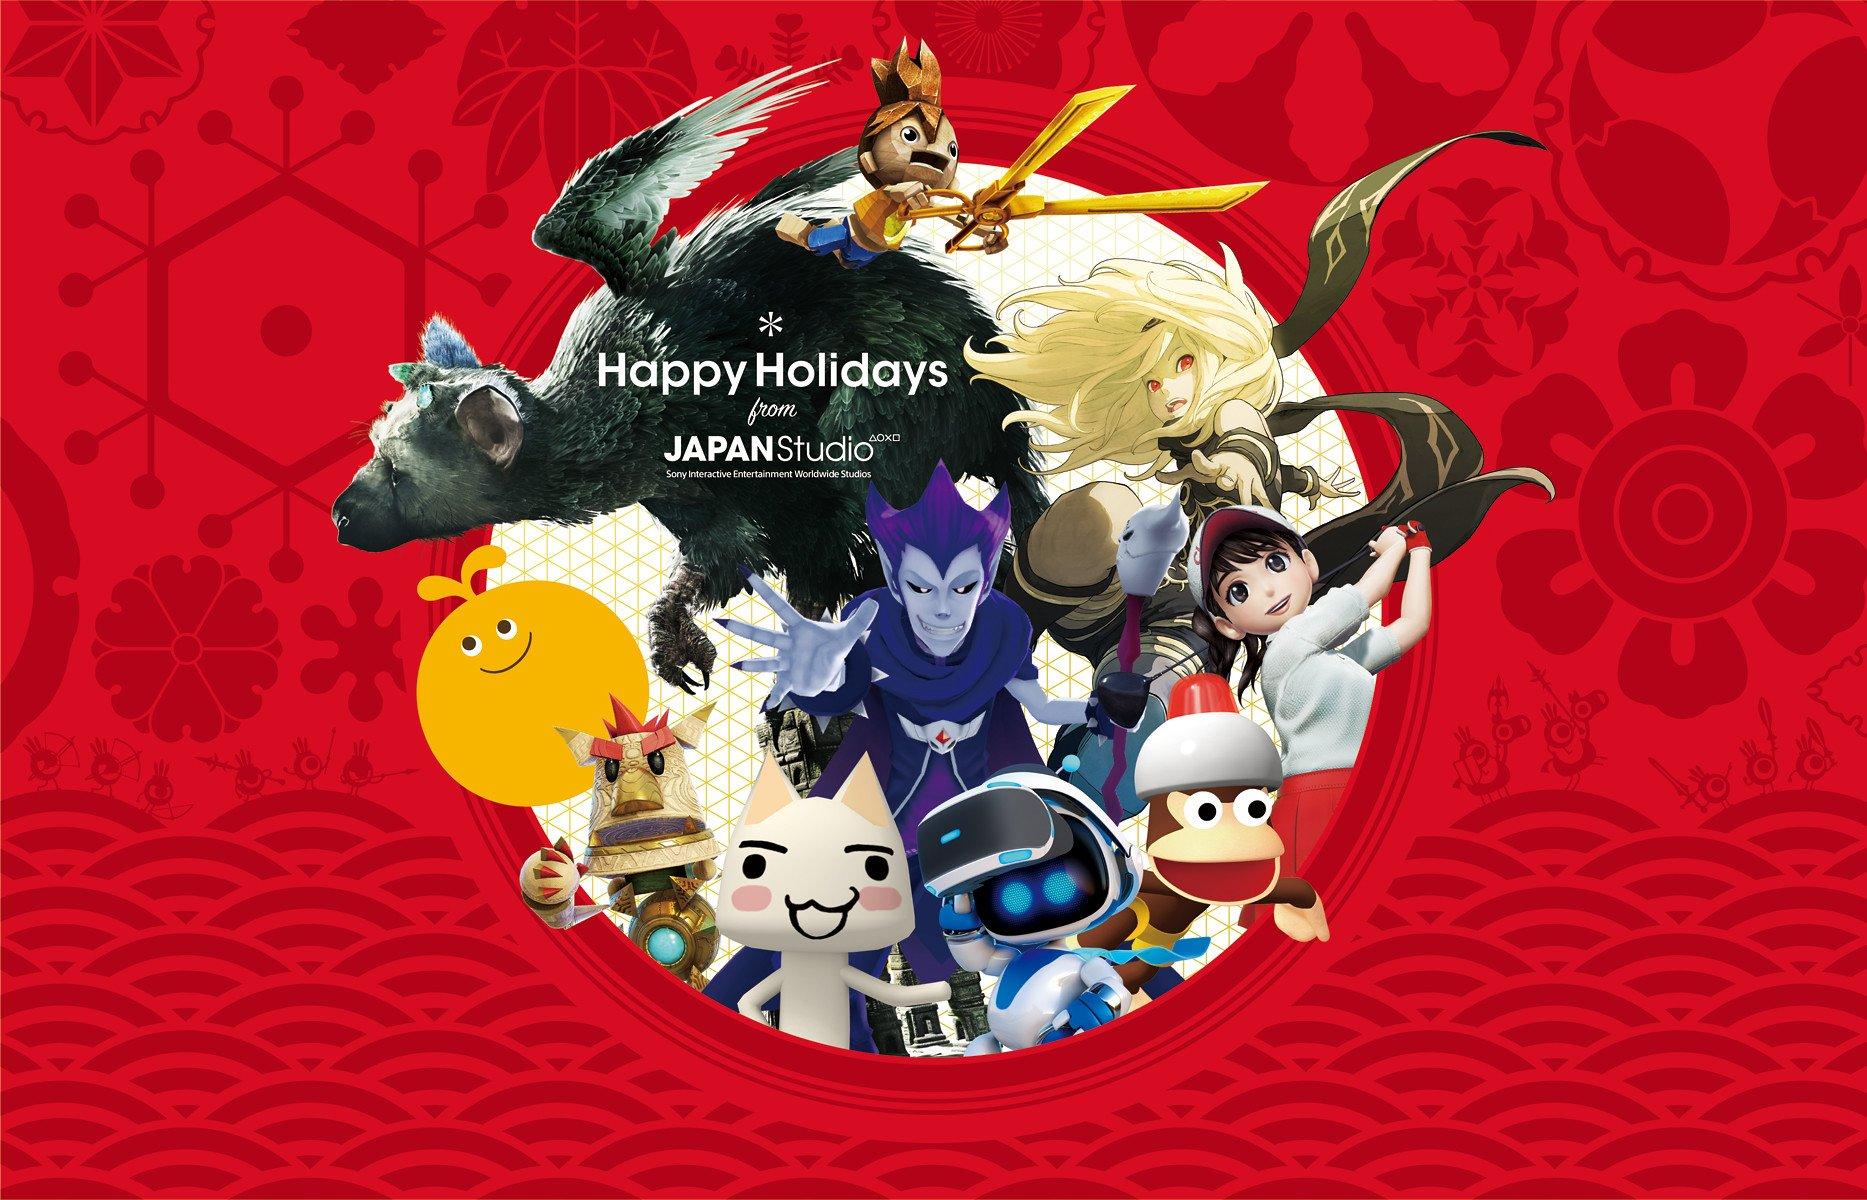 Japan Studio Happy Holidays wallpaper